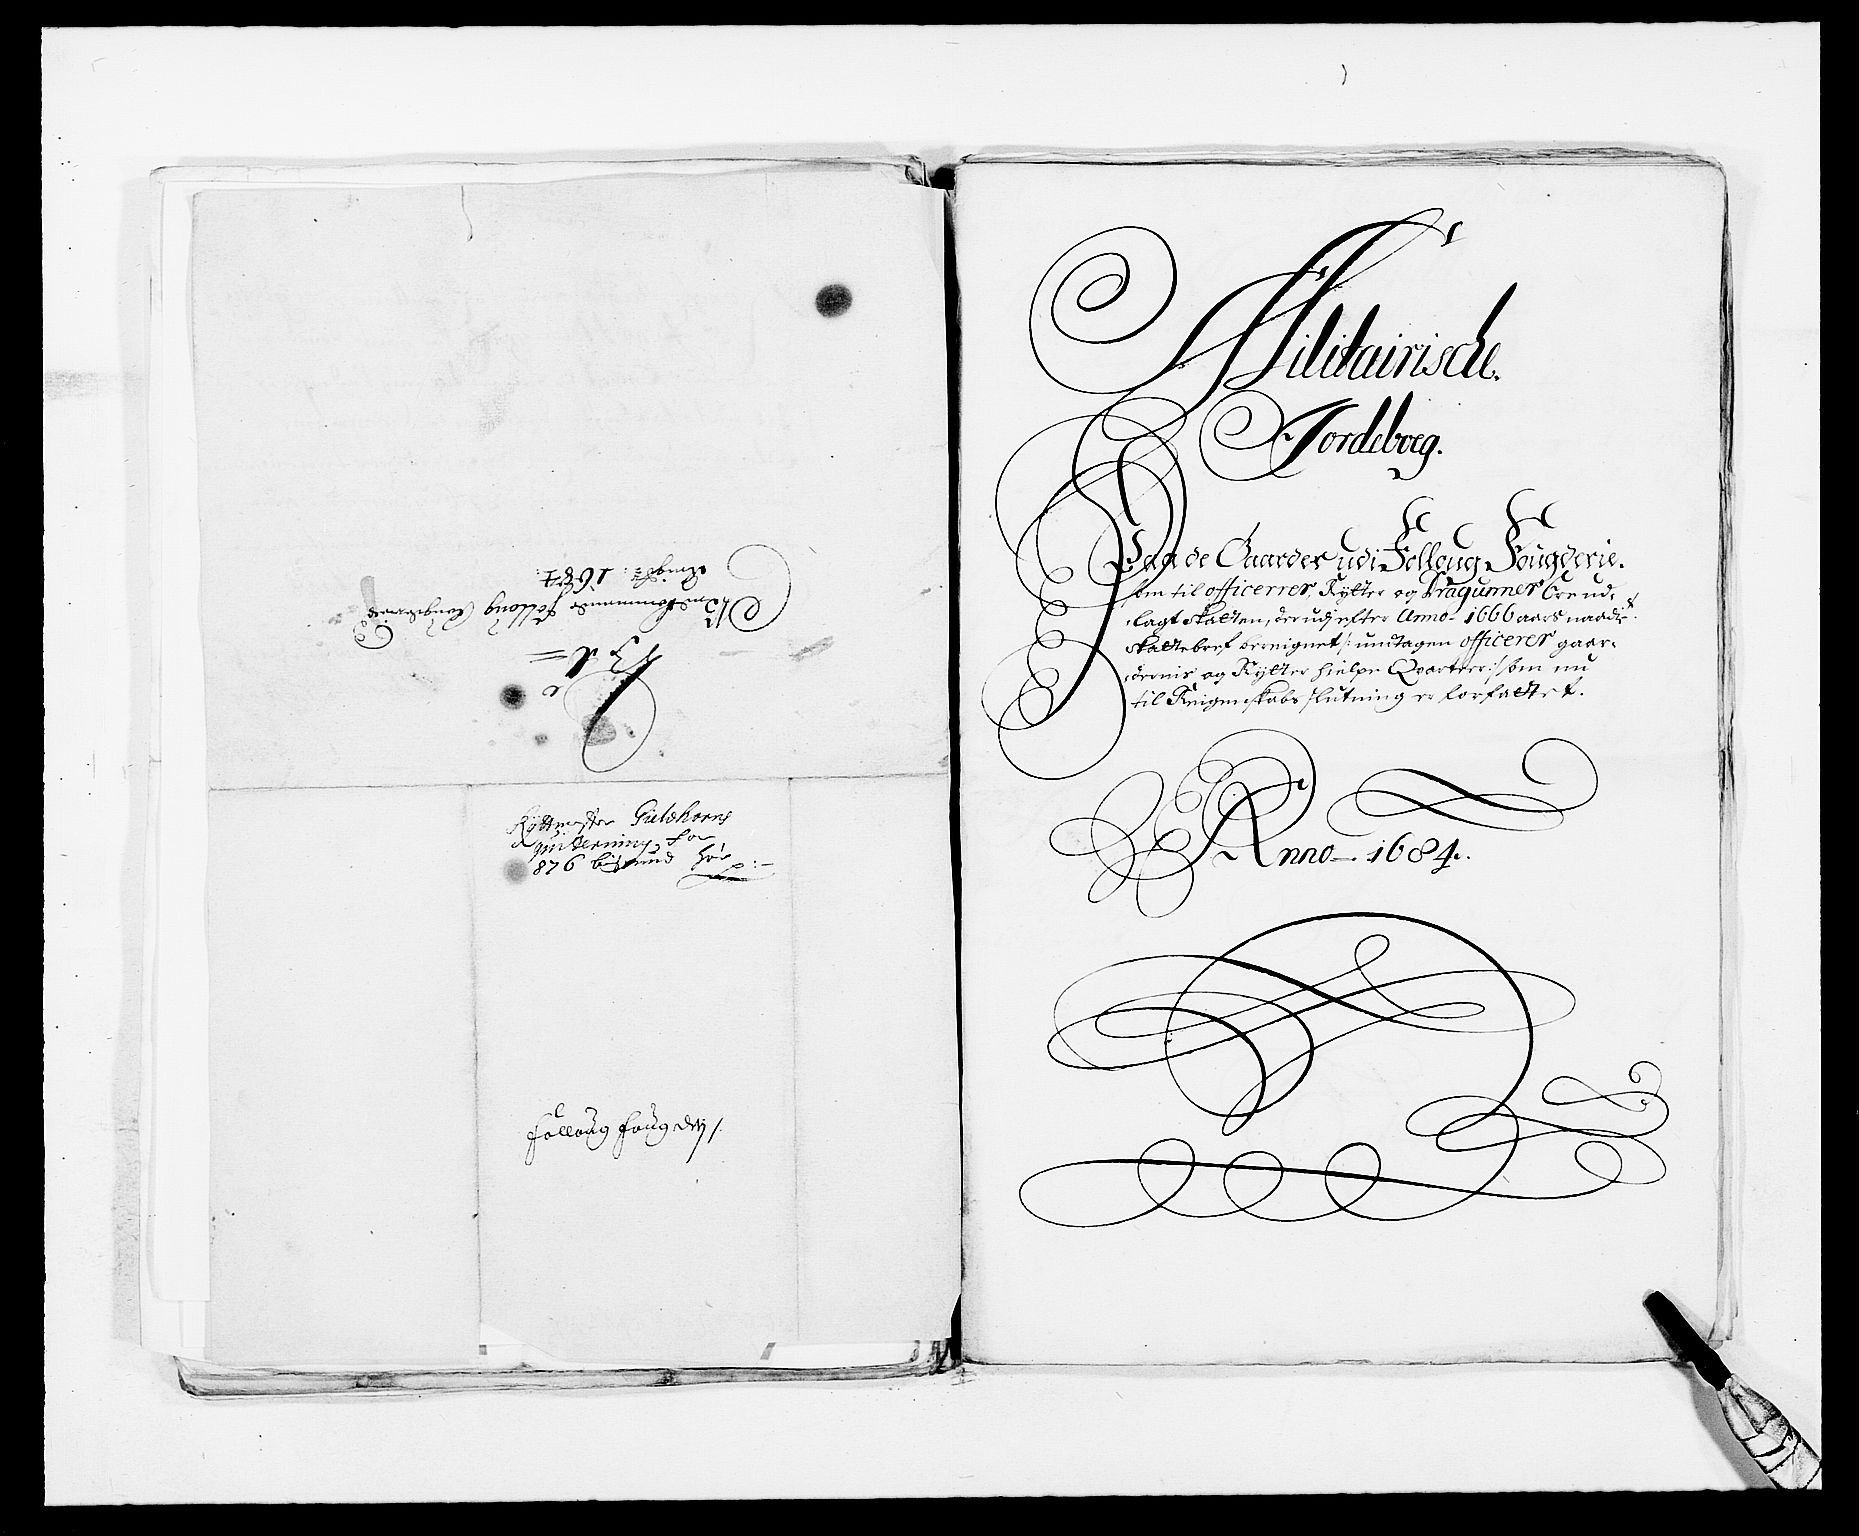 RA, Rentekammeret inntil 1814, Reviderte regnskaper, Fogderegnskap, R09/L0432: Fogderegnskap Follo, 1680-1684, s. 123